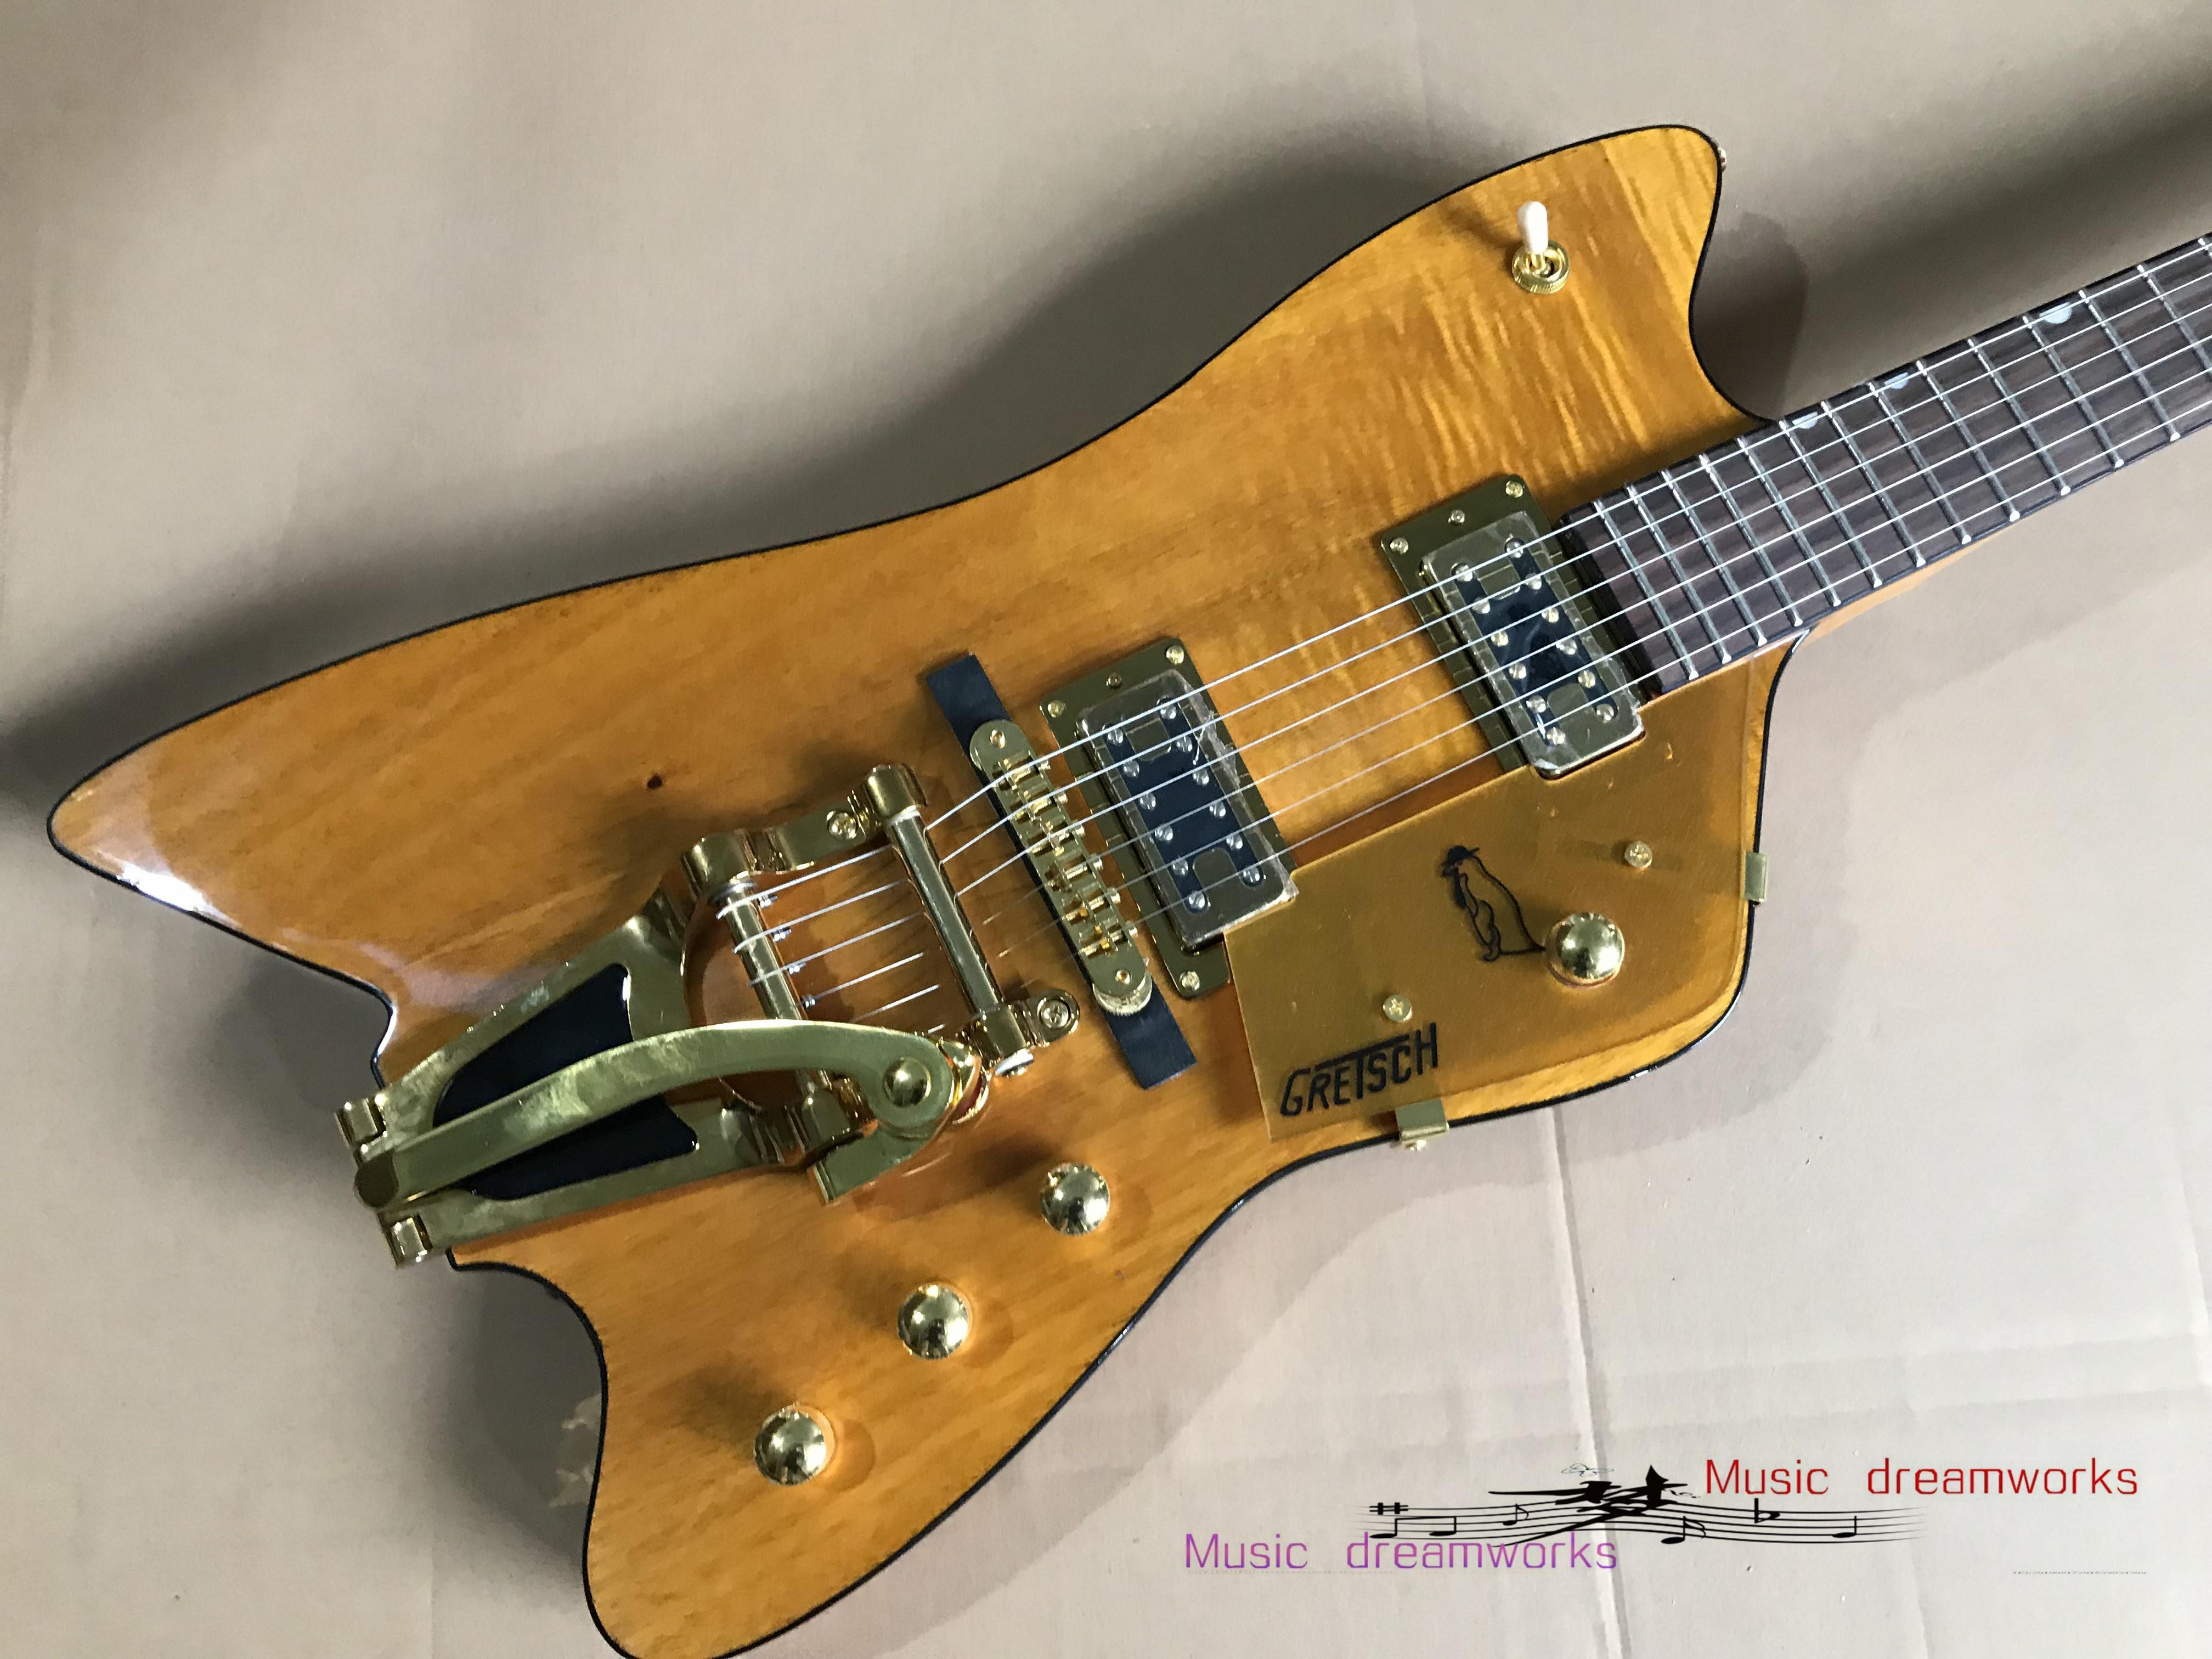 Porcellana Guitar elettrico Guitar OEM Chitarra elettrica Guitar Big Jazz Vibrato System, colore giallo